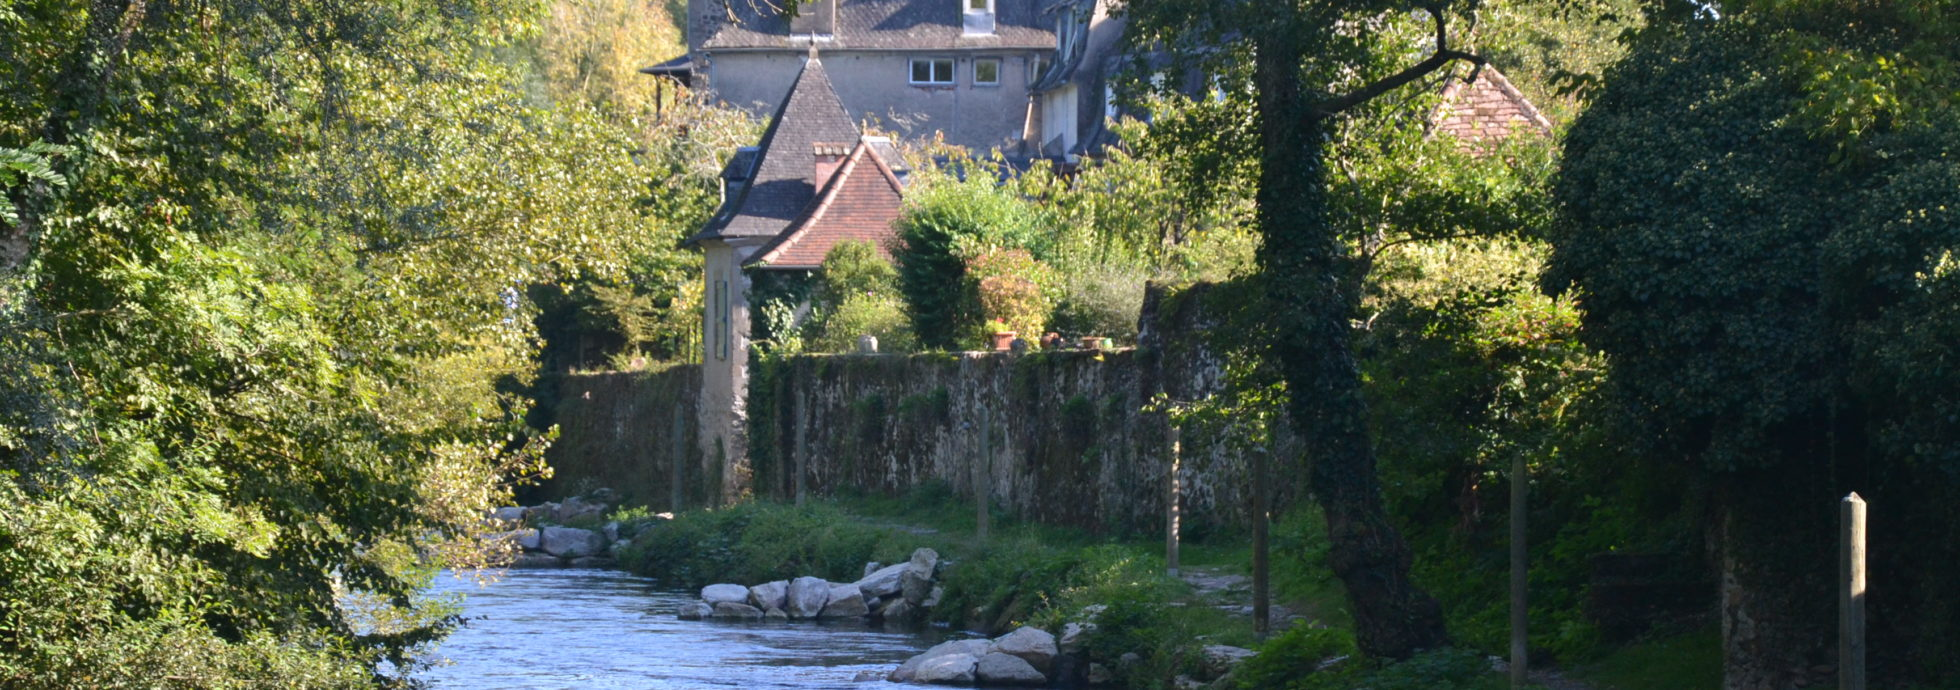 Dordogne a Beaulieu